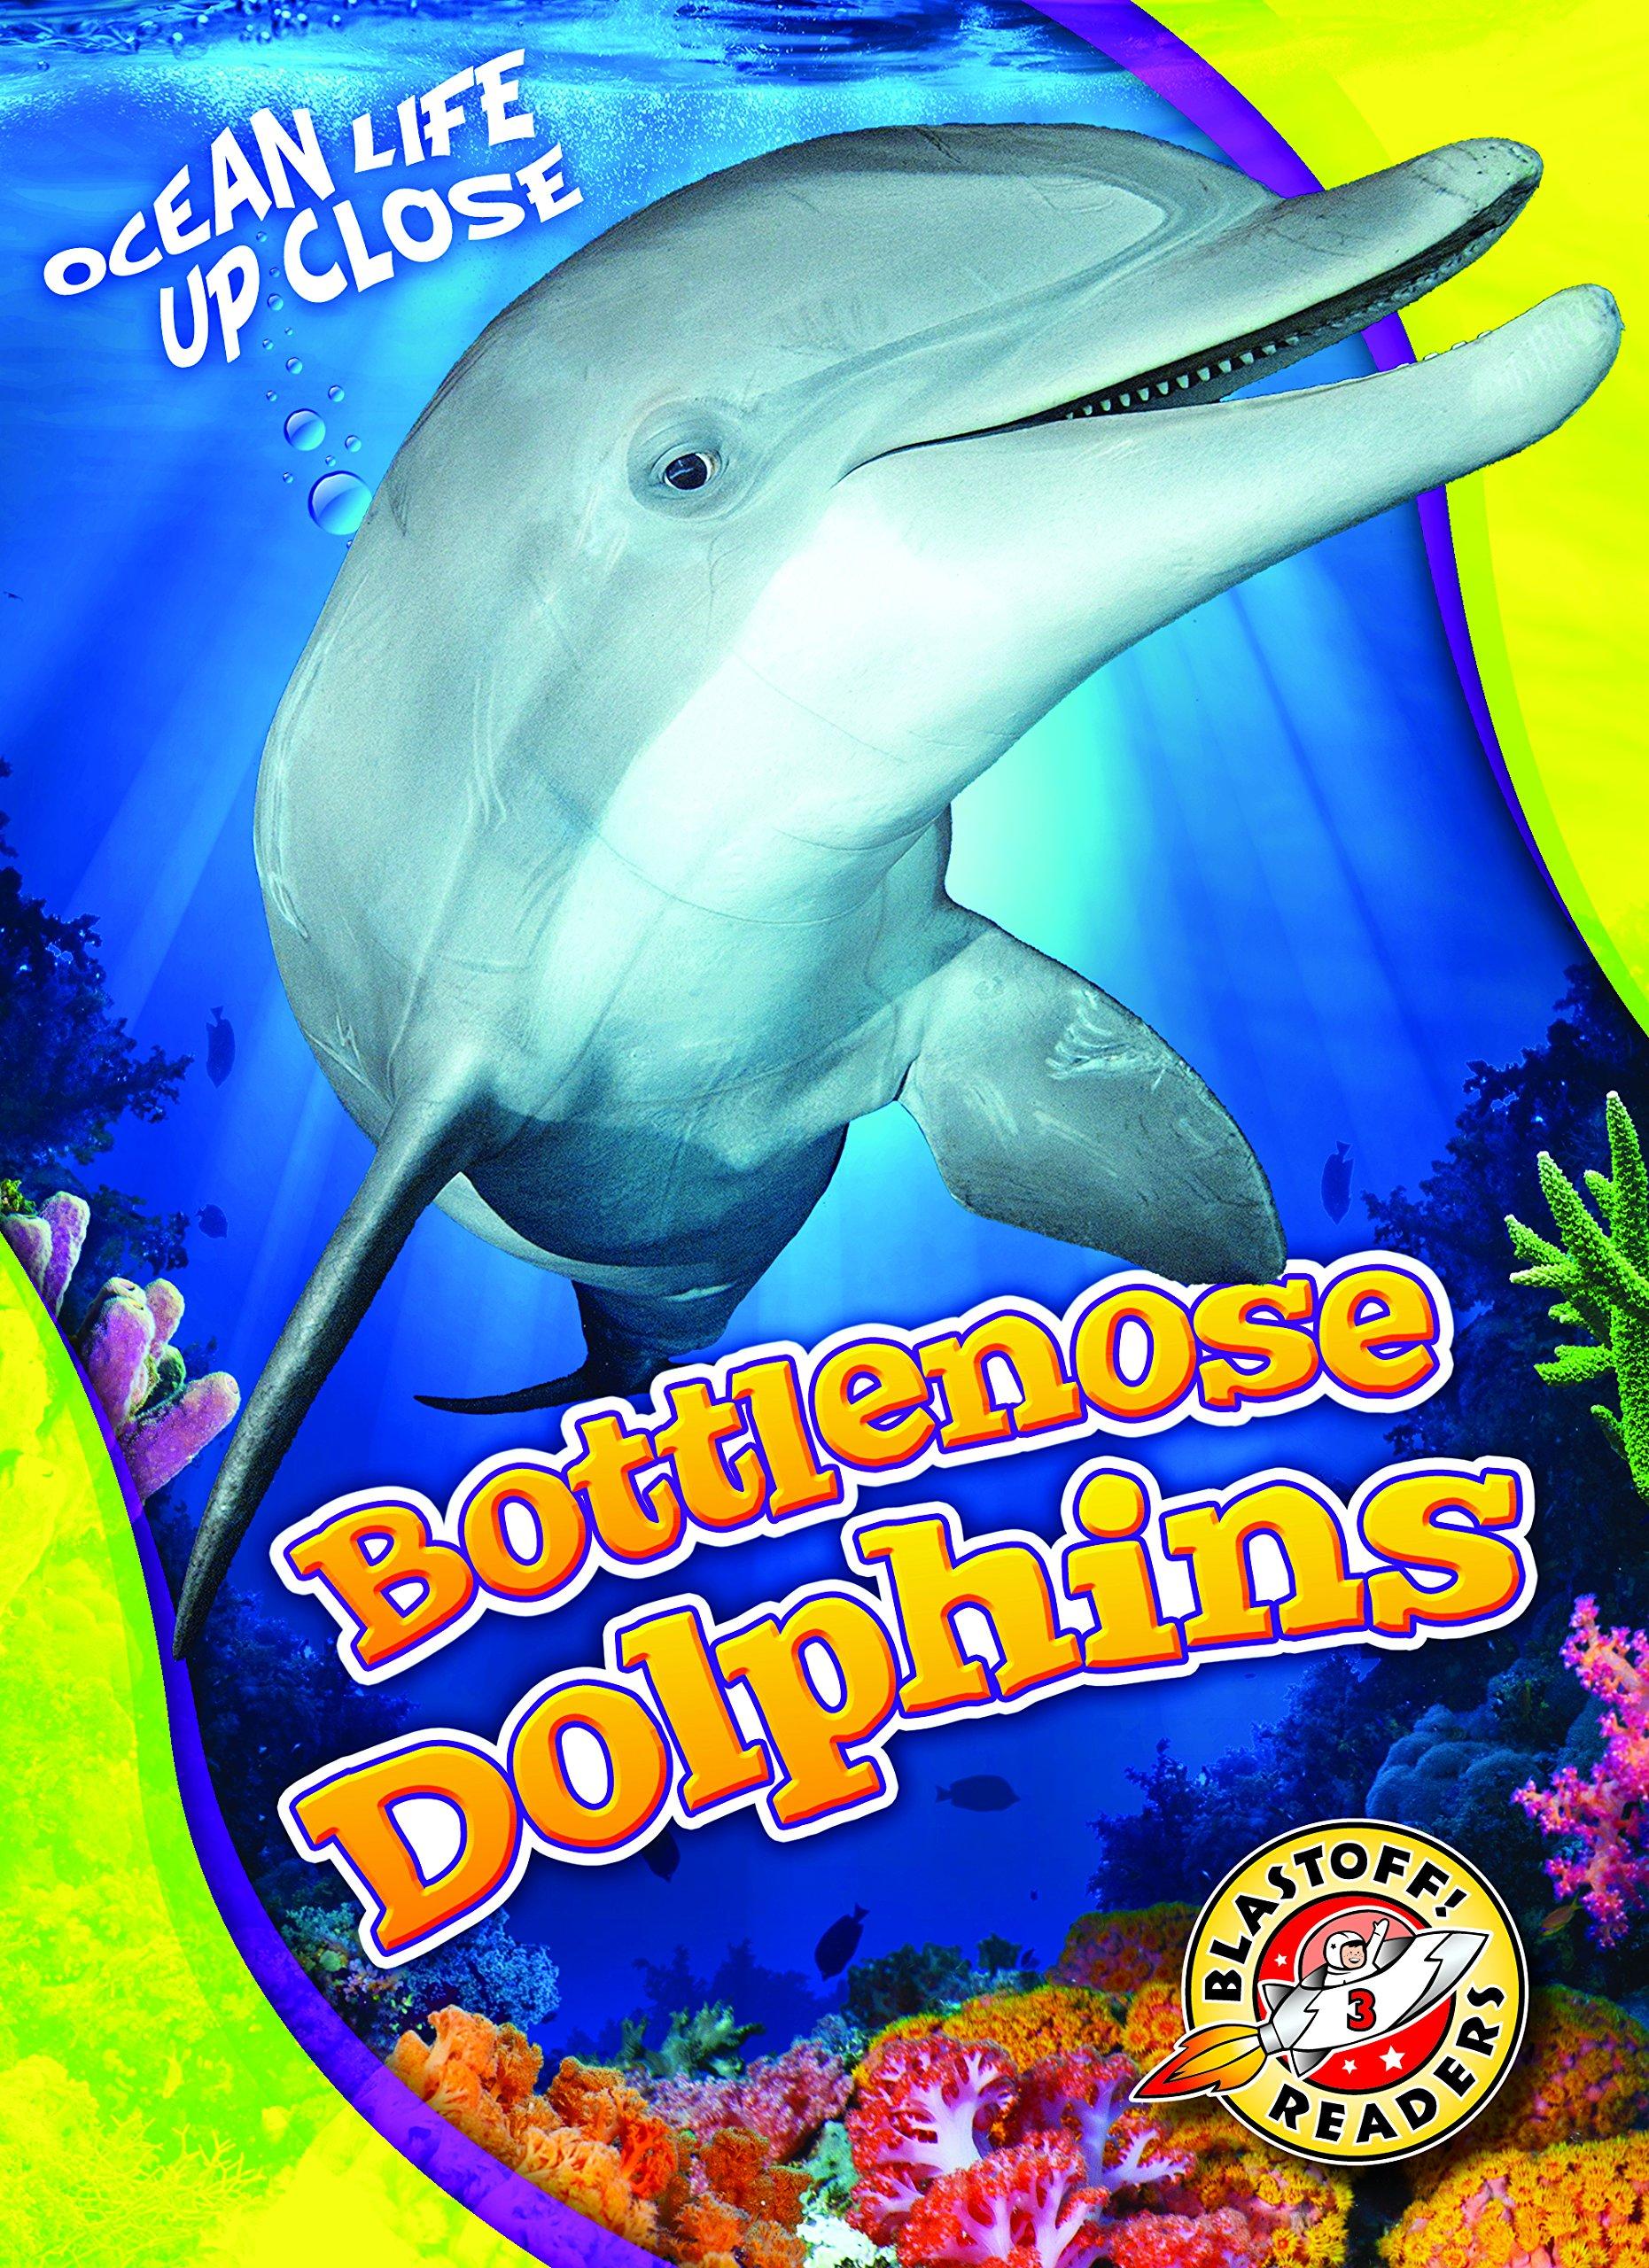 Bottlenose Dolphins (Blastoff Readers. Level 3)